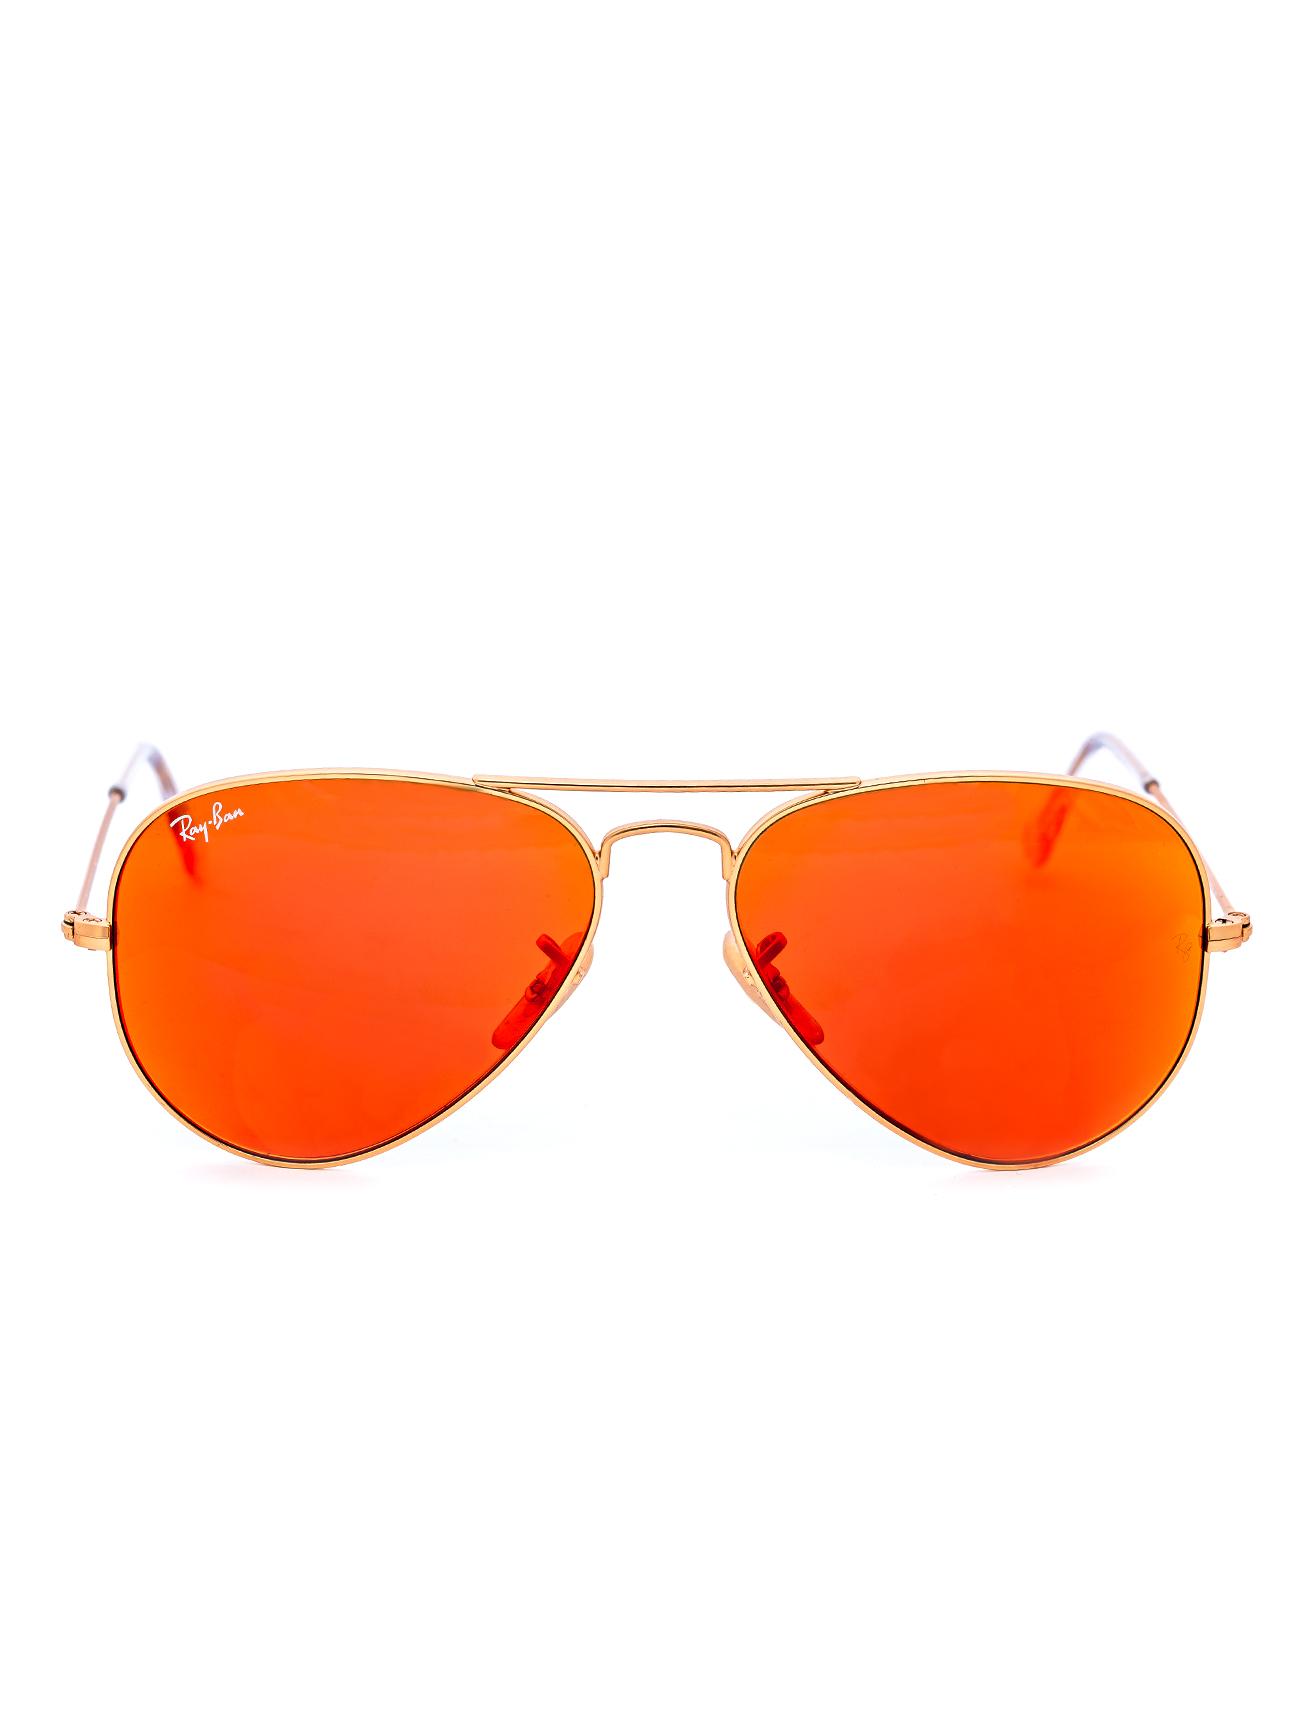 31b876d40f Ray Ban Mirrored Aviators Orange « Heritage Malta